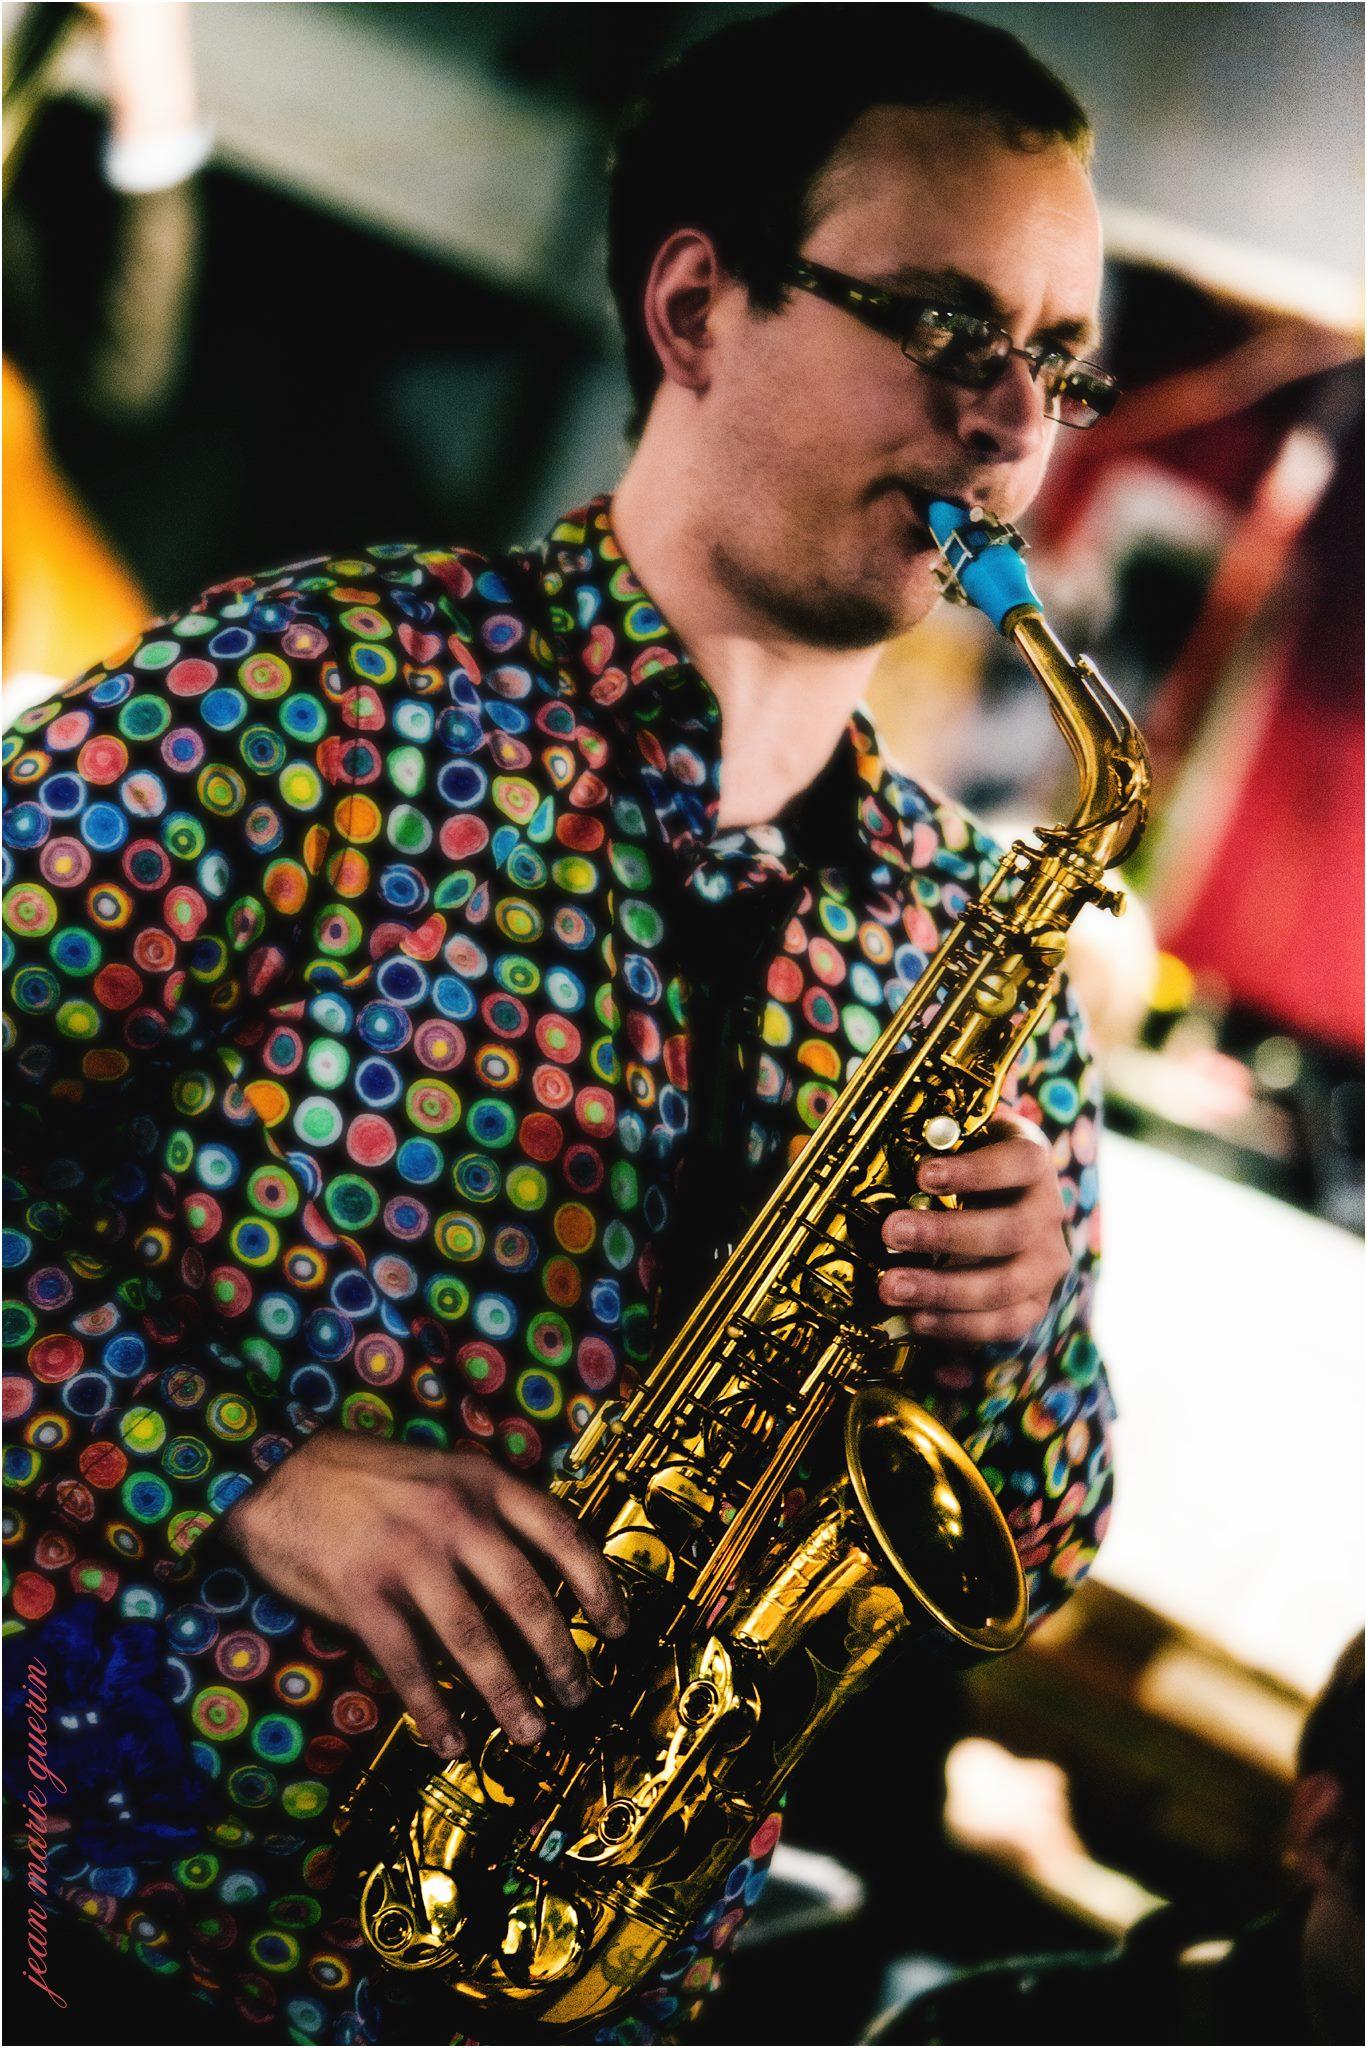 Pascal Mabit and his Syos blue alto saxophone mouthpiece